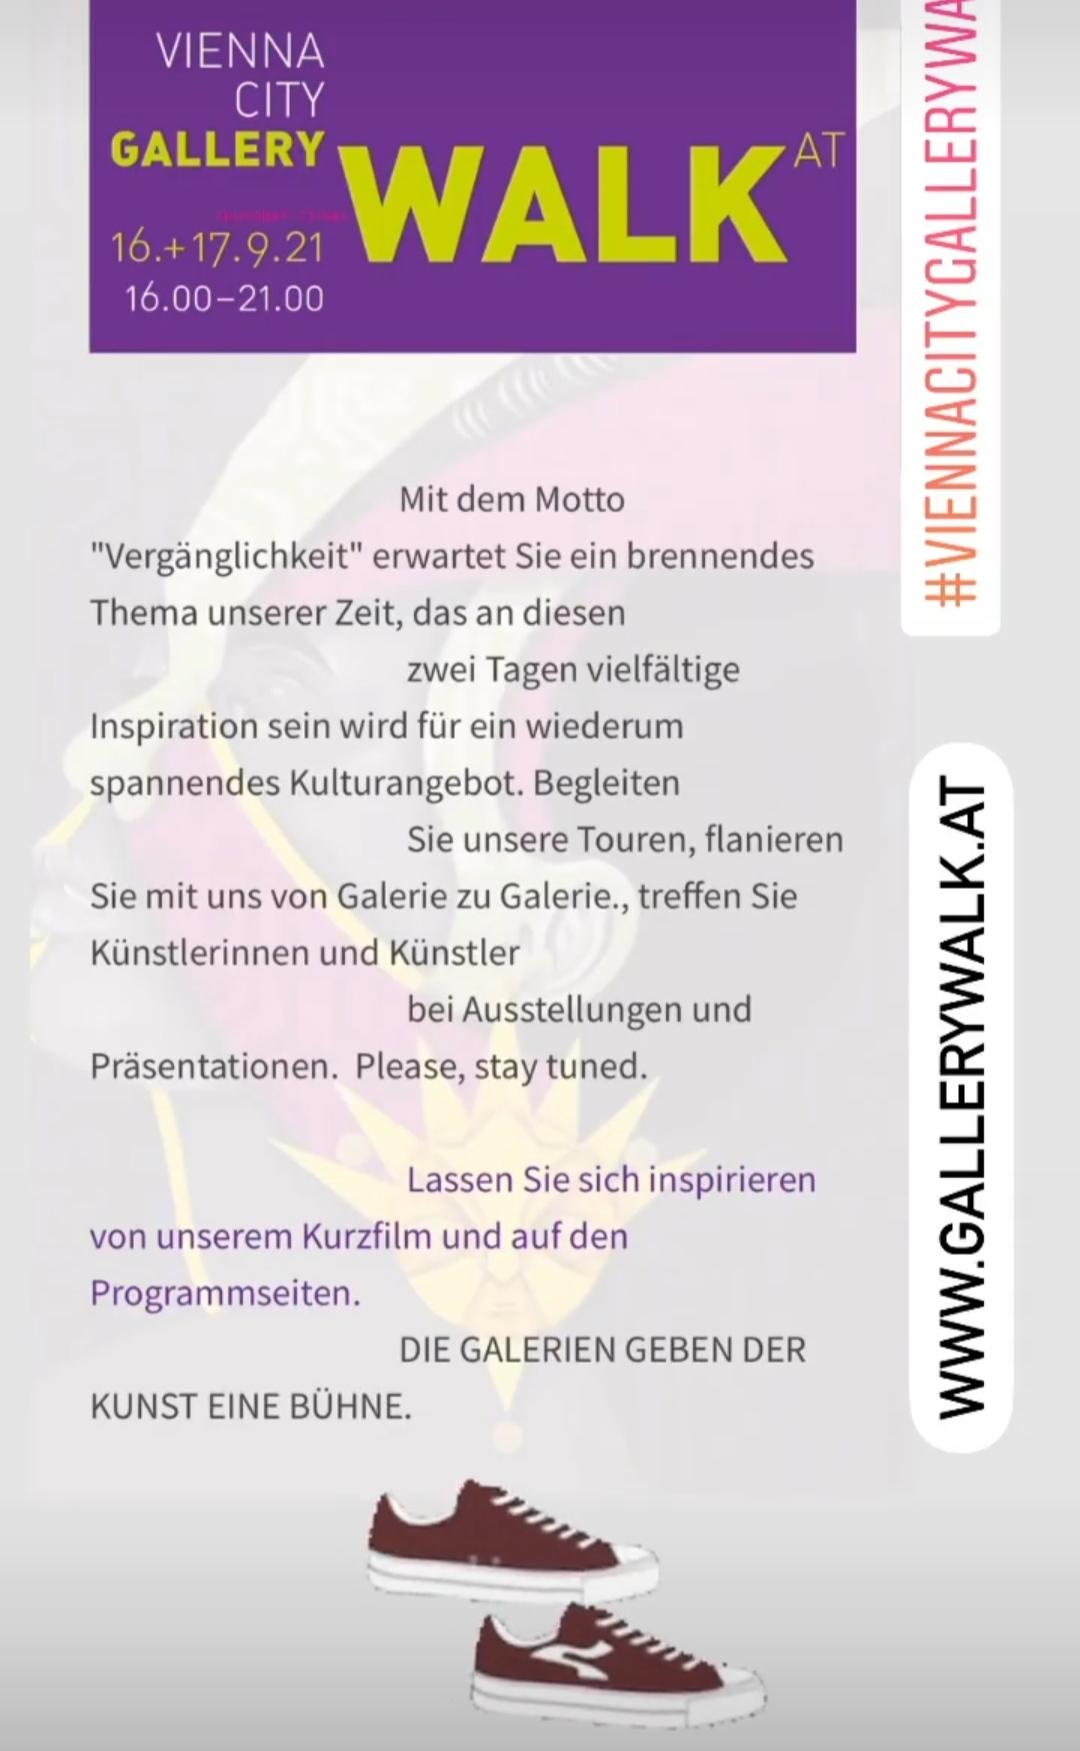 Gallery Walk Poster